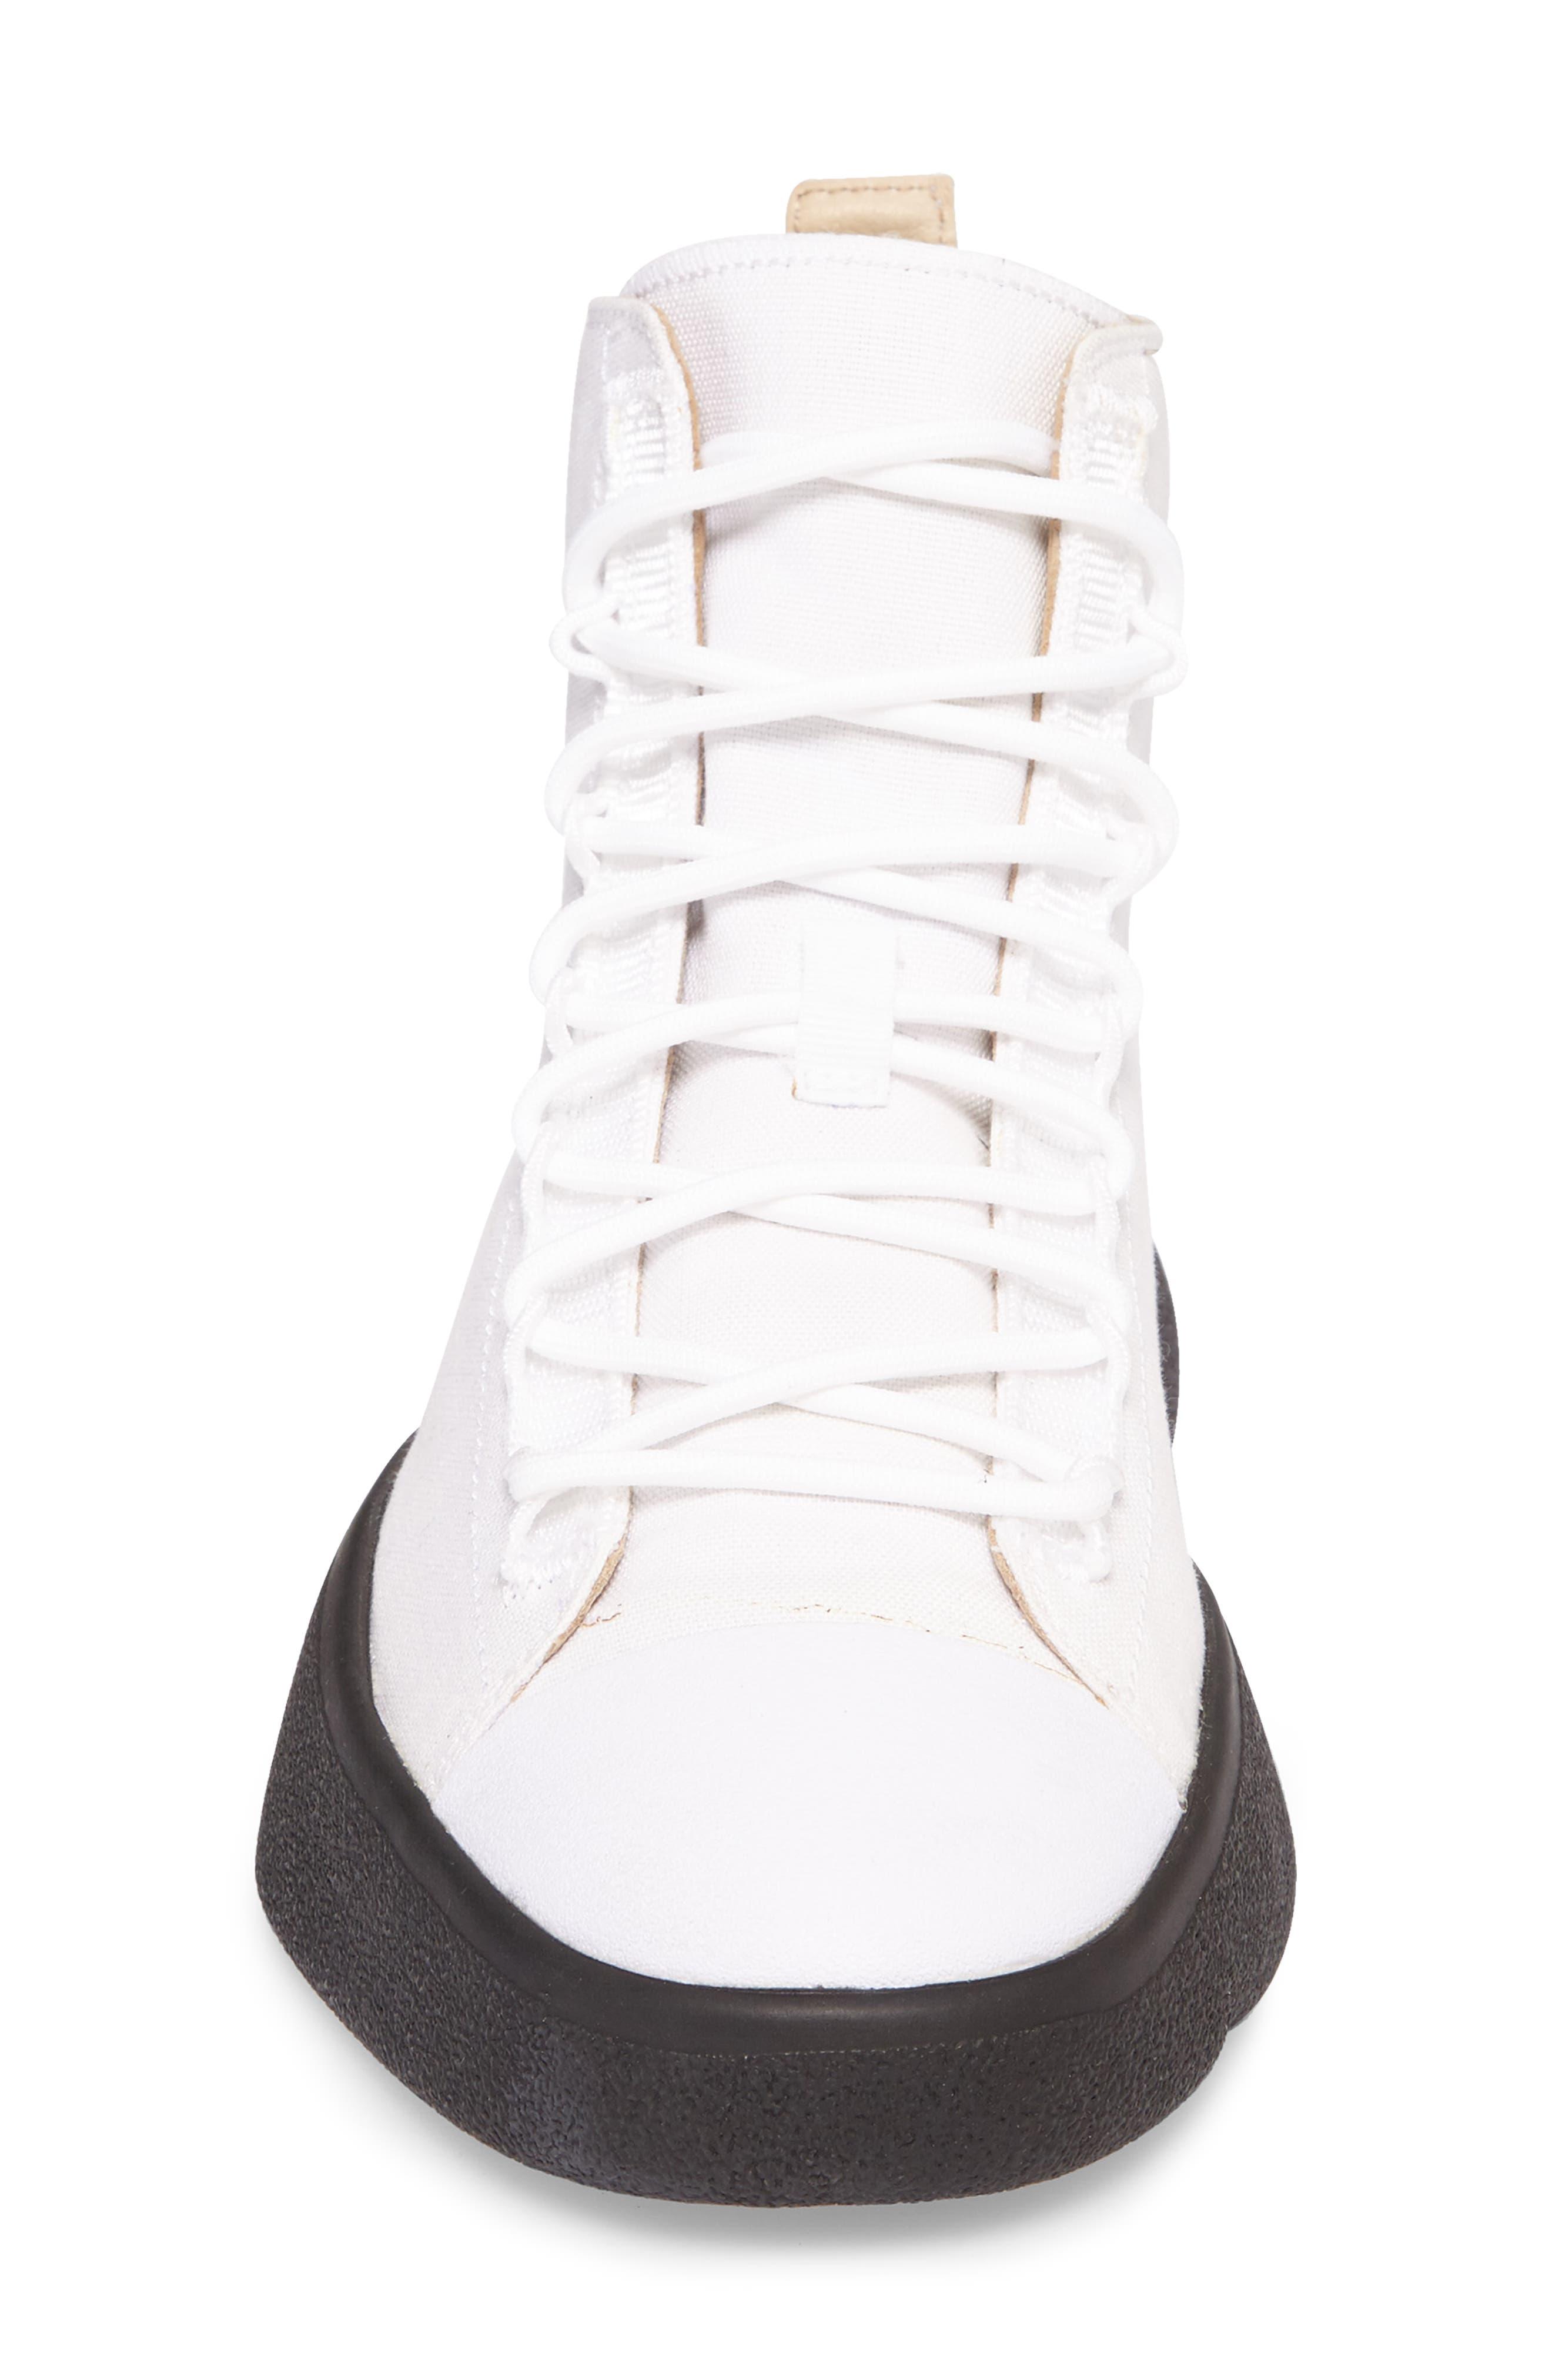 Bashyo High Top Sneaker,                             Alternate thumbnail 4, color,                             100